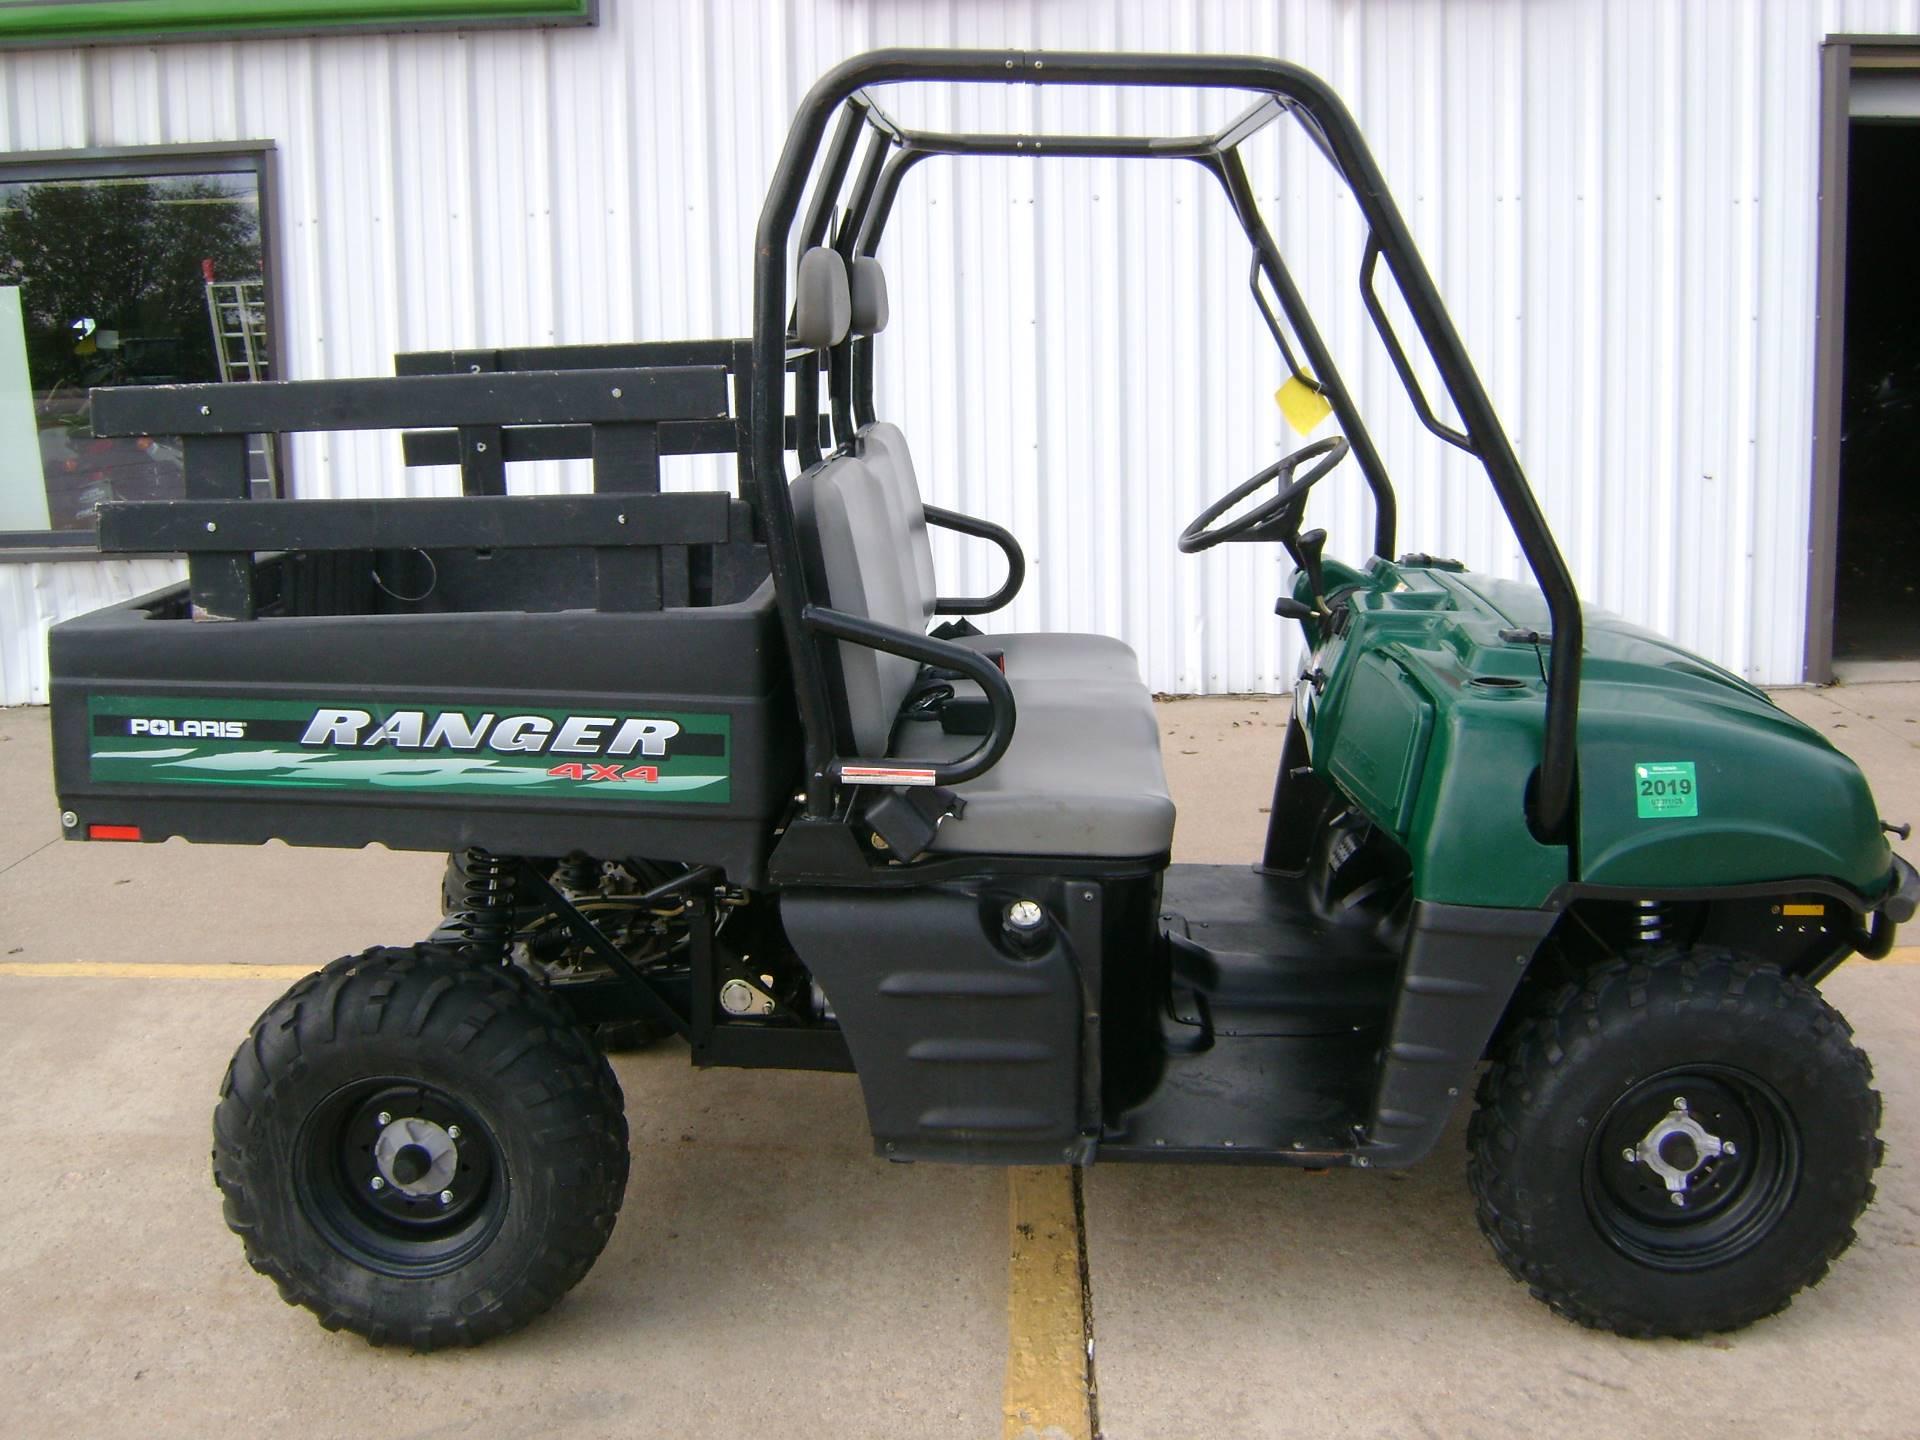 2004 Polaris RANGER 500 4X4 for sale 253037